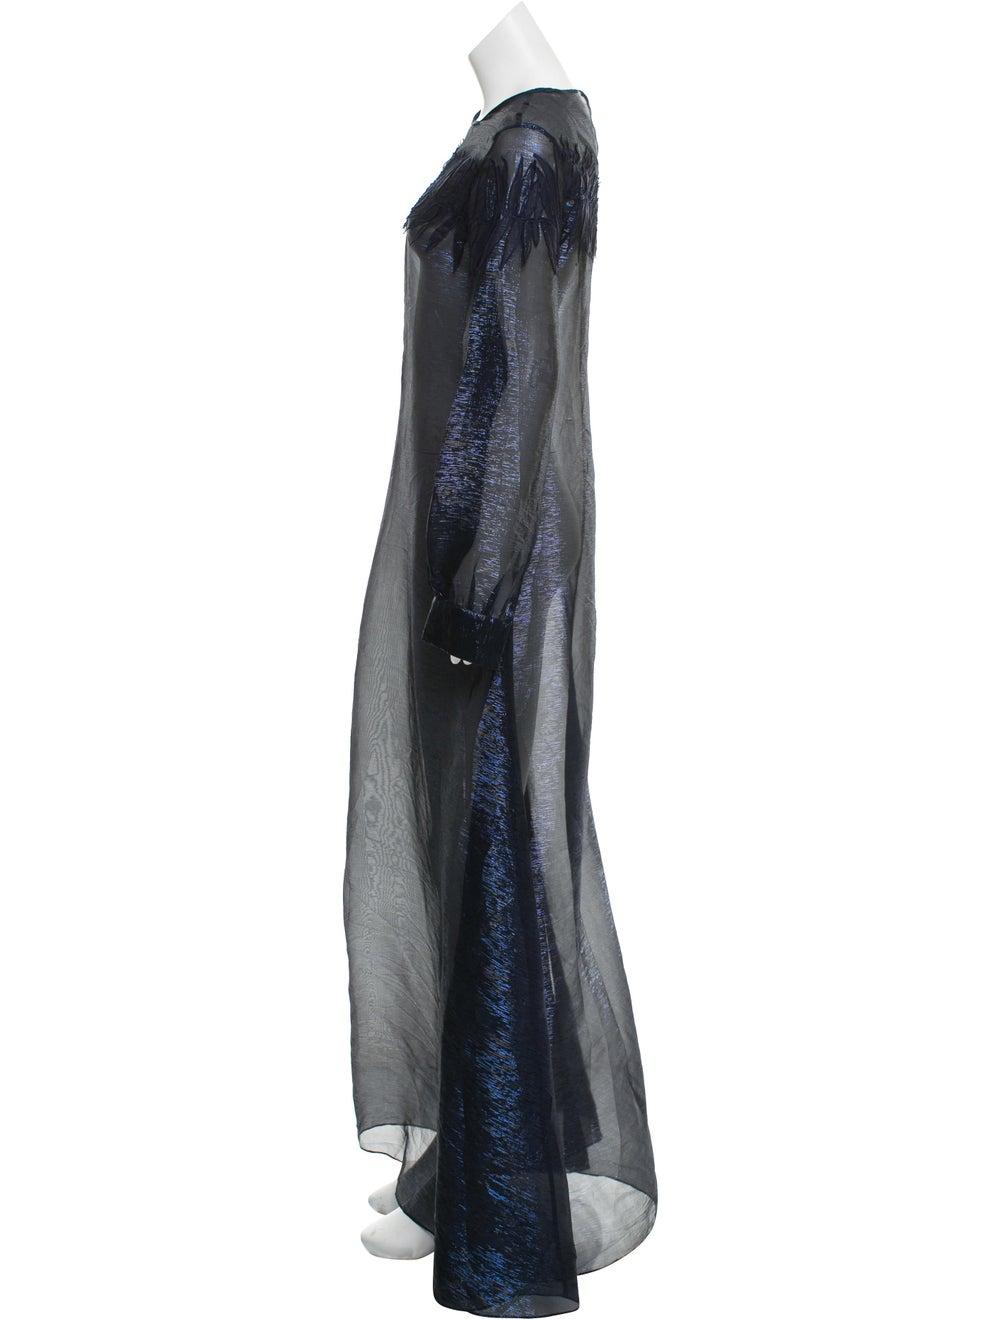 Oscar de la Renta Metallic Maxi Dress Navy - image 2